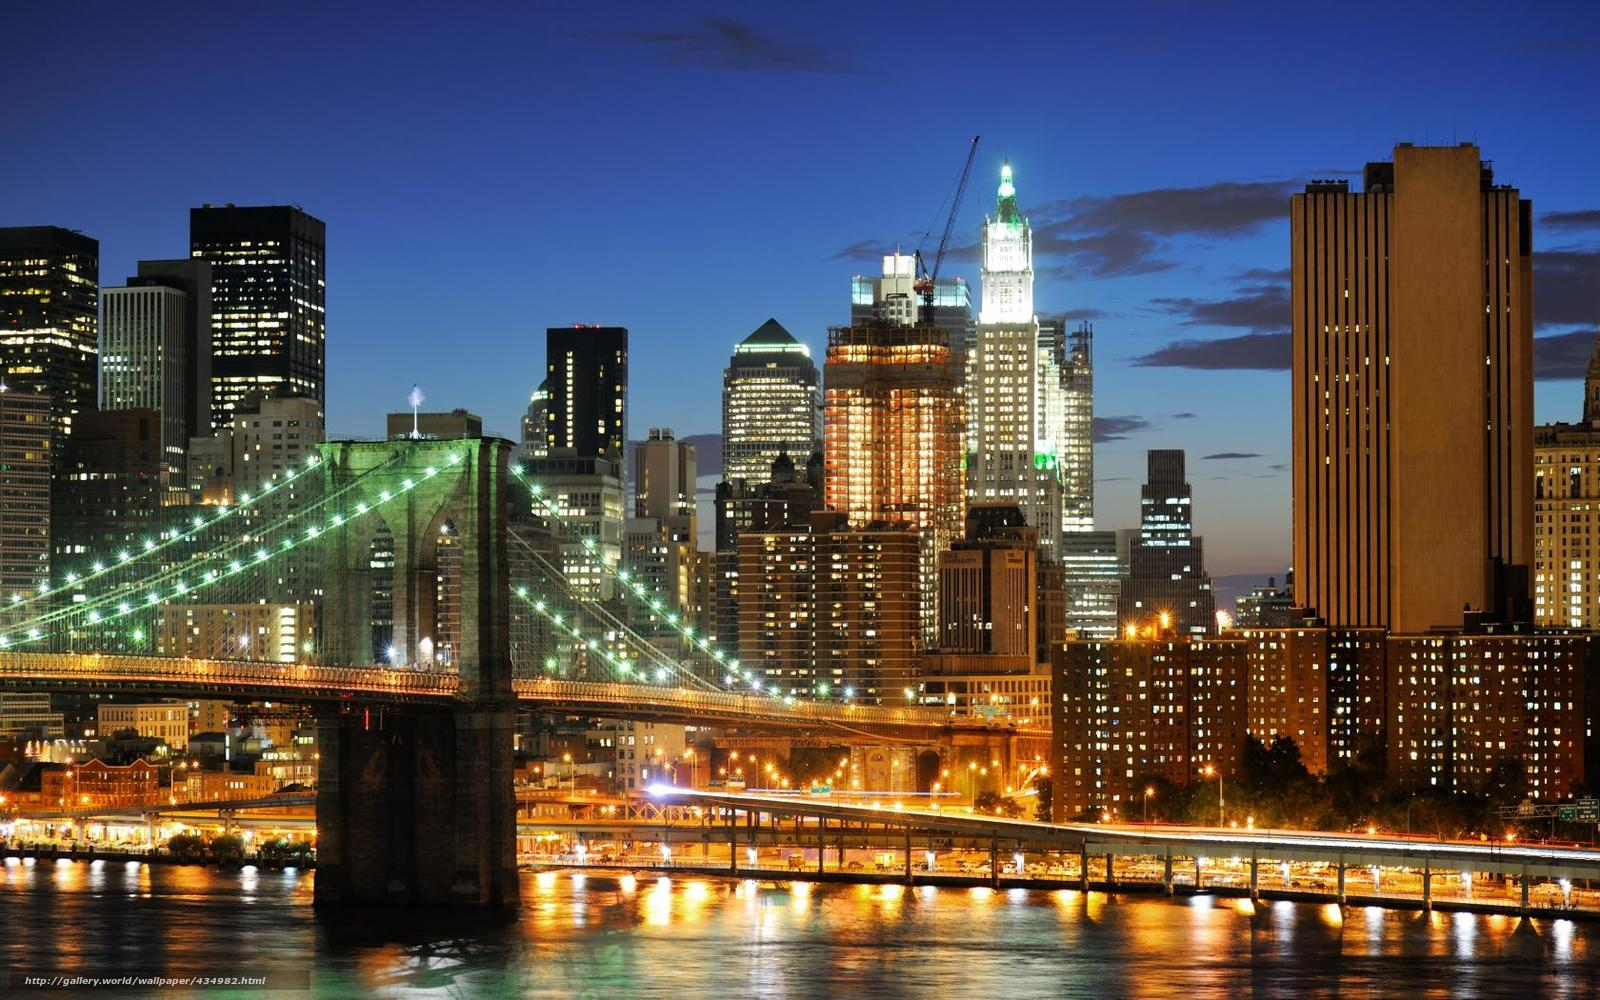 Tlcharger Fond Decran New York Brooklyn Bridge Gratte